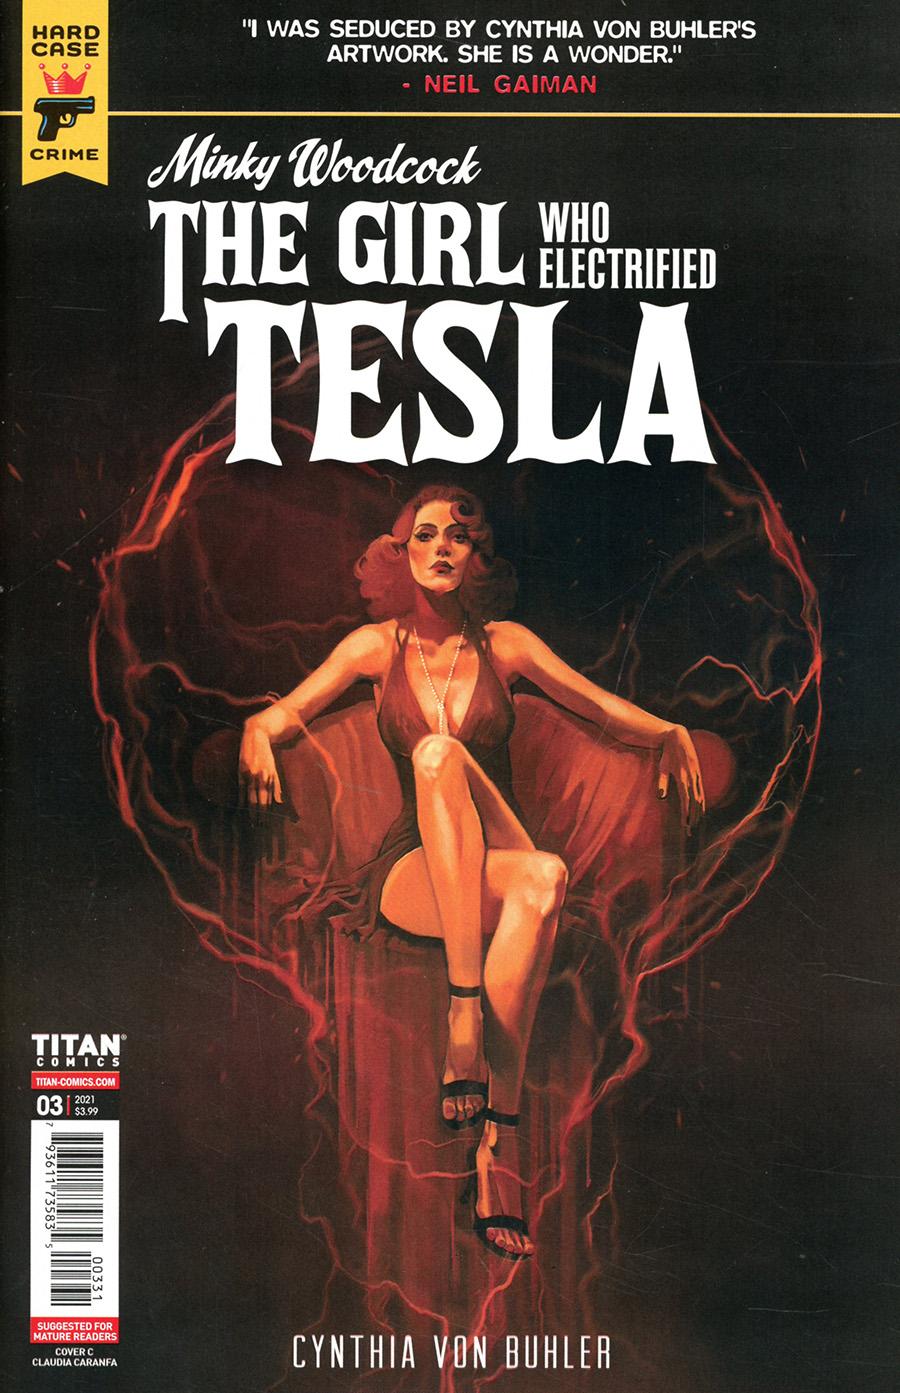 Hard Case Crime Minky Woodcock Girl Who Electrified Tesla #3 Cover C Variant Claudia Caranfa Cover